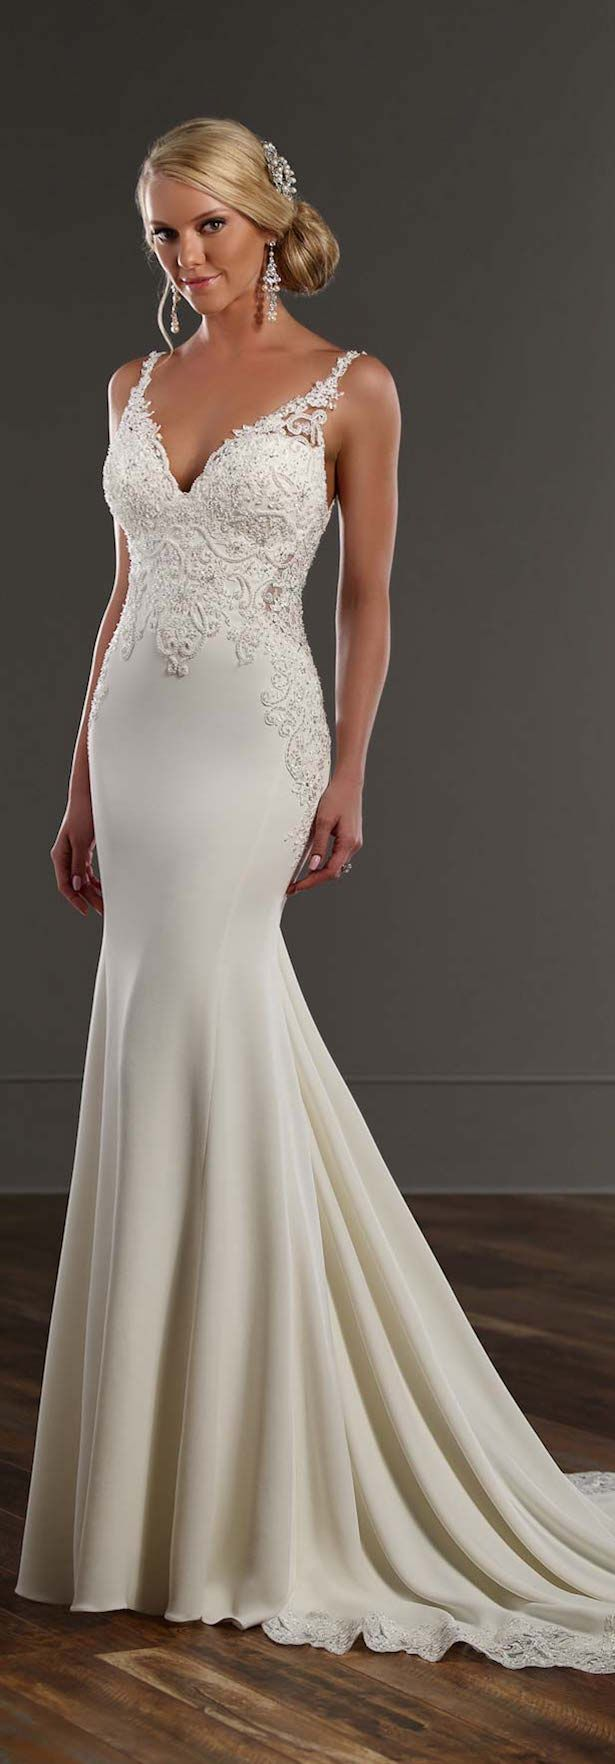 Martina Liana Spring 2016 Bridal Collection | Hochzeitskleider ...